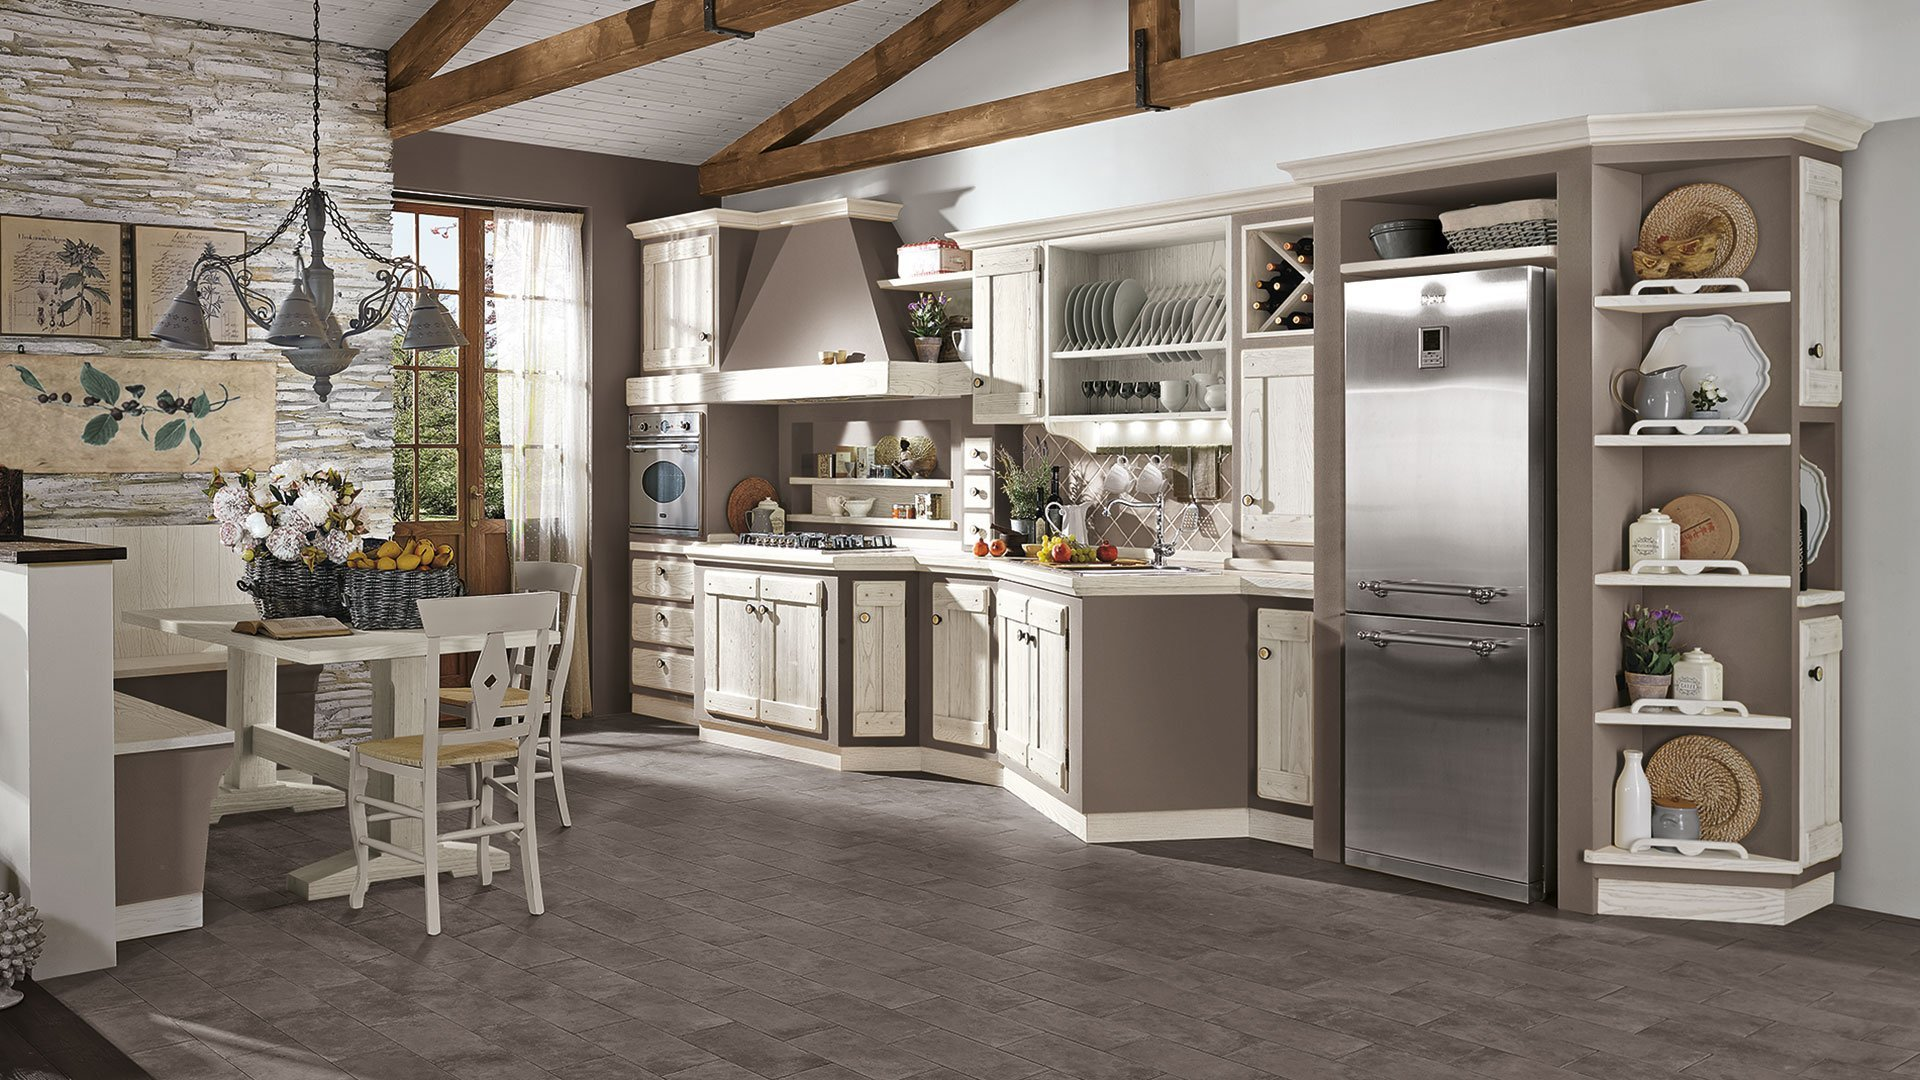 Cucina Anita Borgo Antico - Vissani Casa